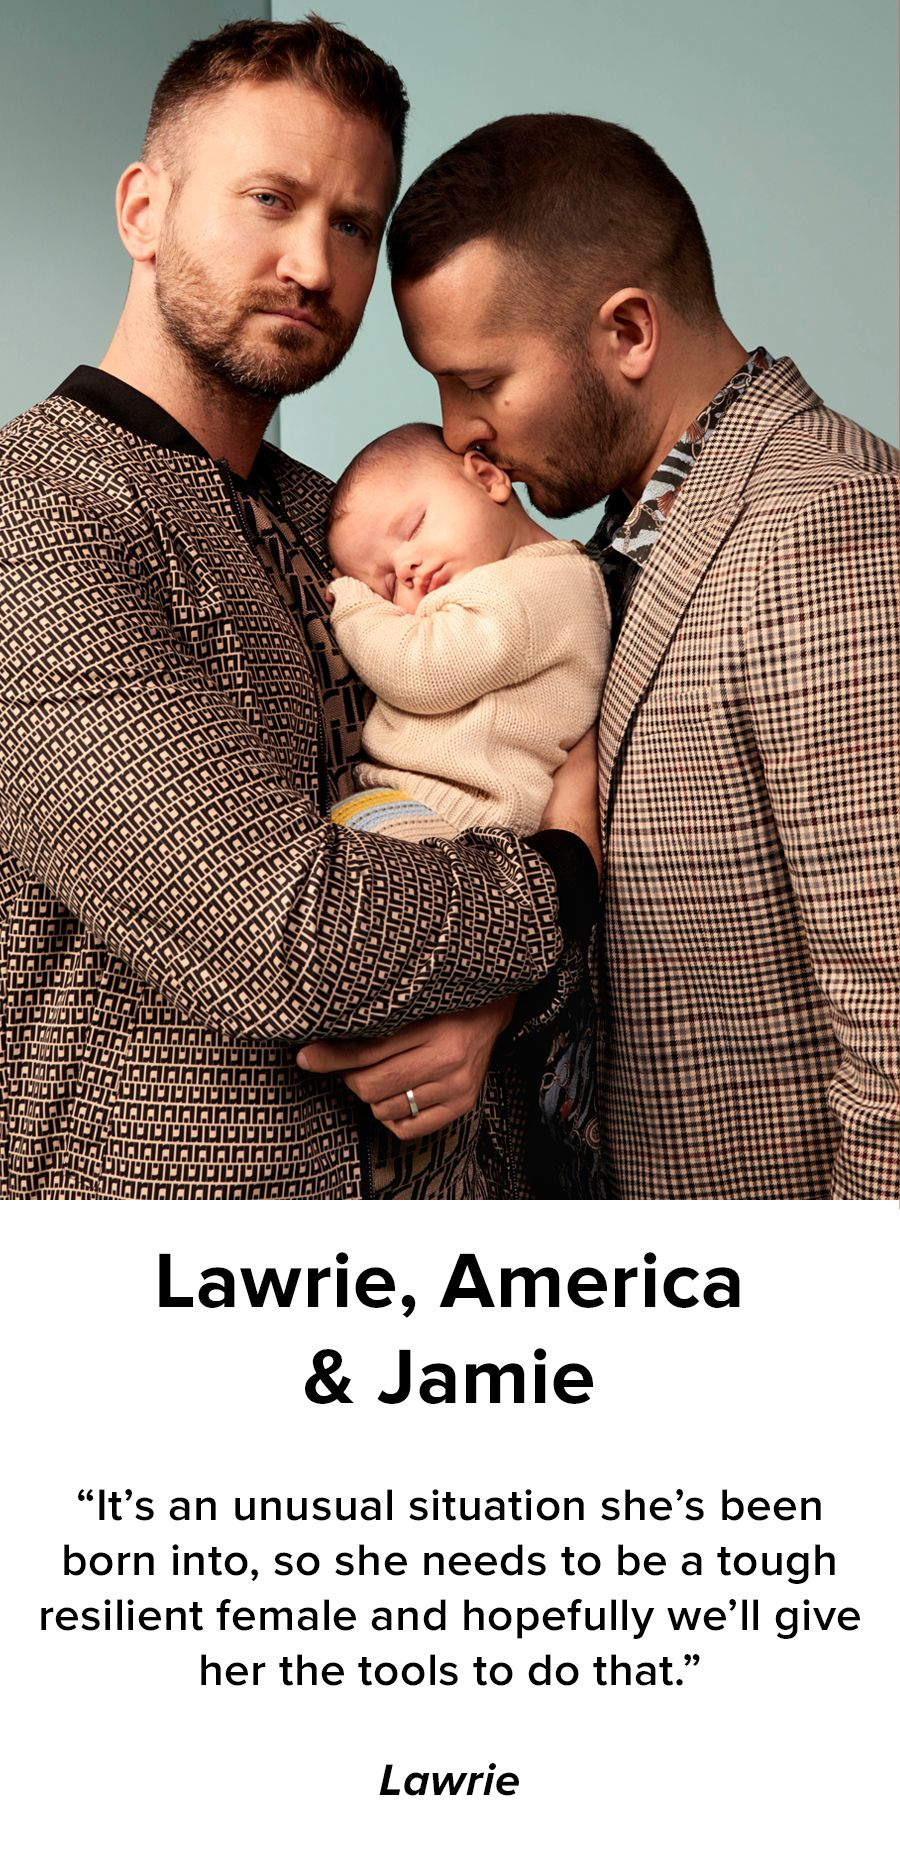 Lawrie, America & Jamie